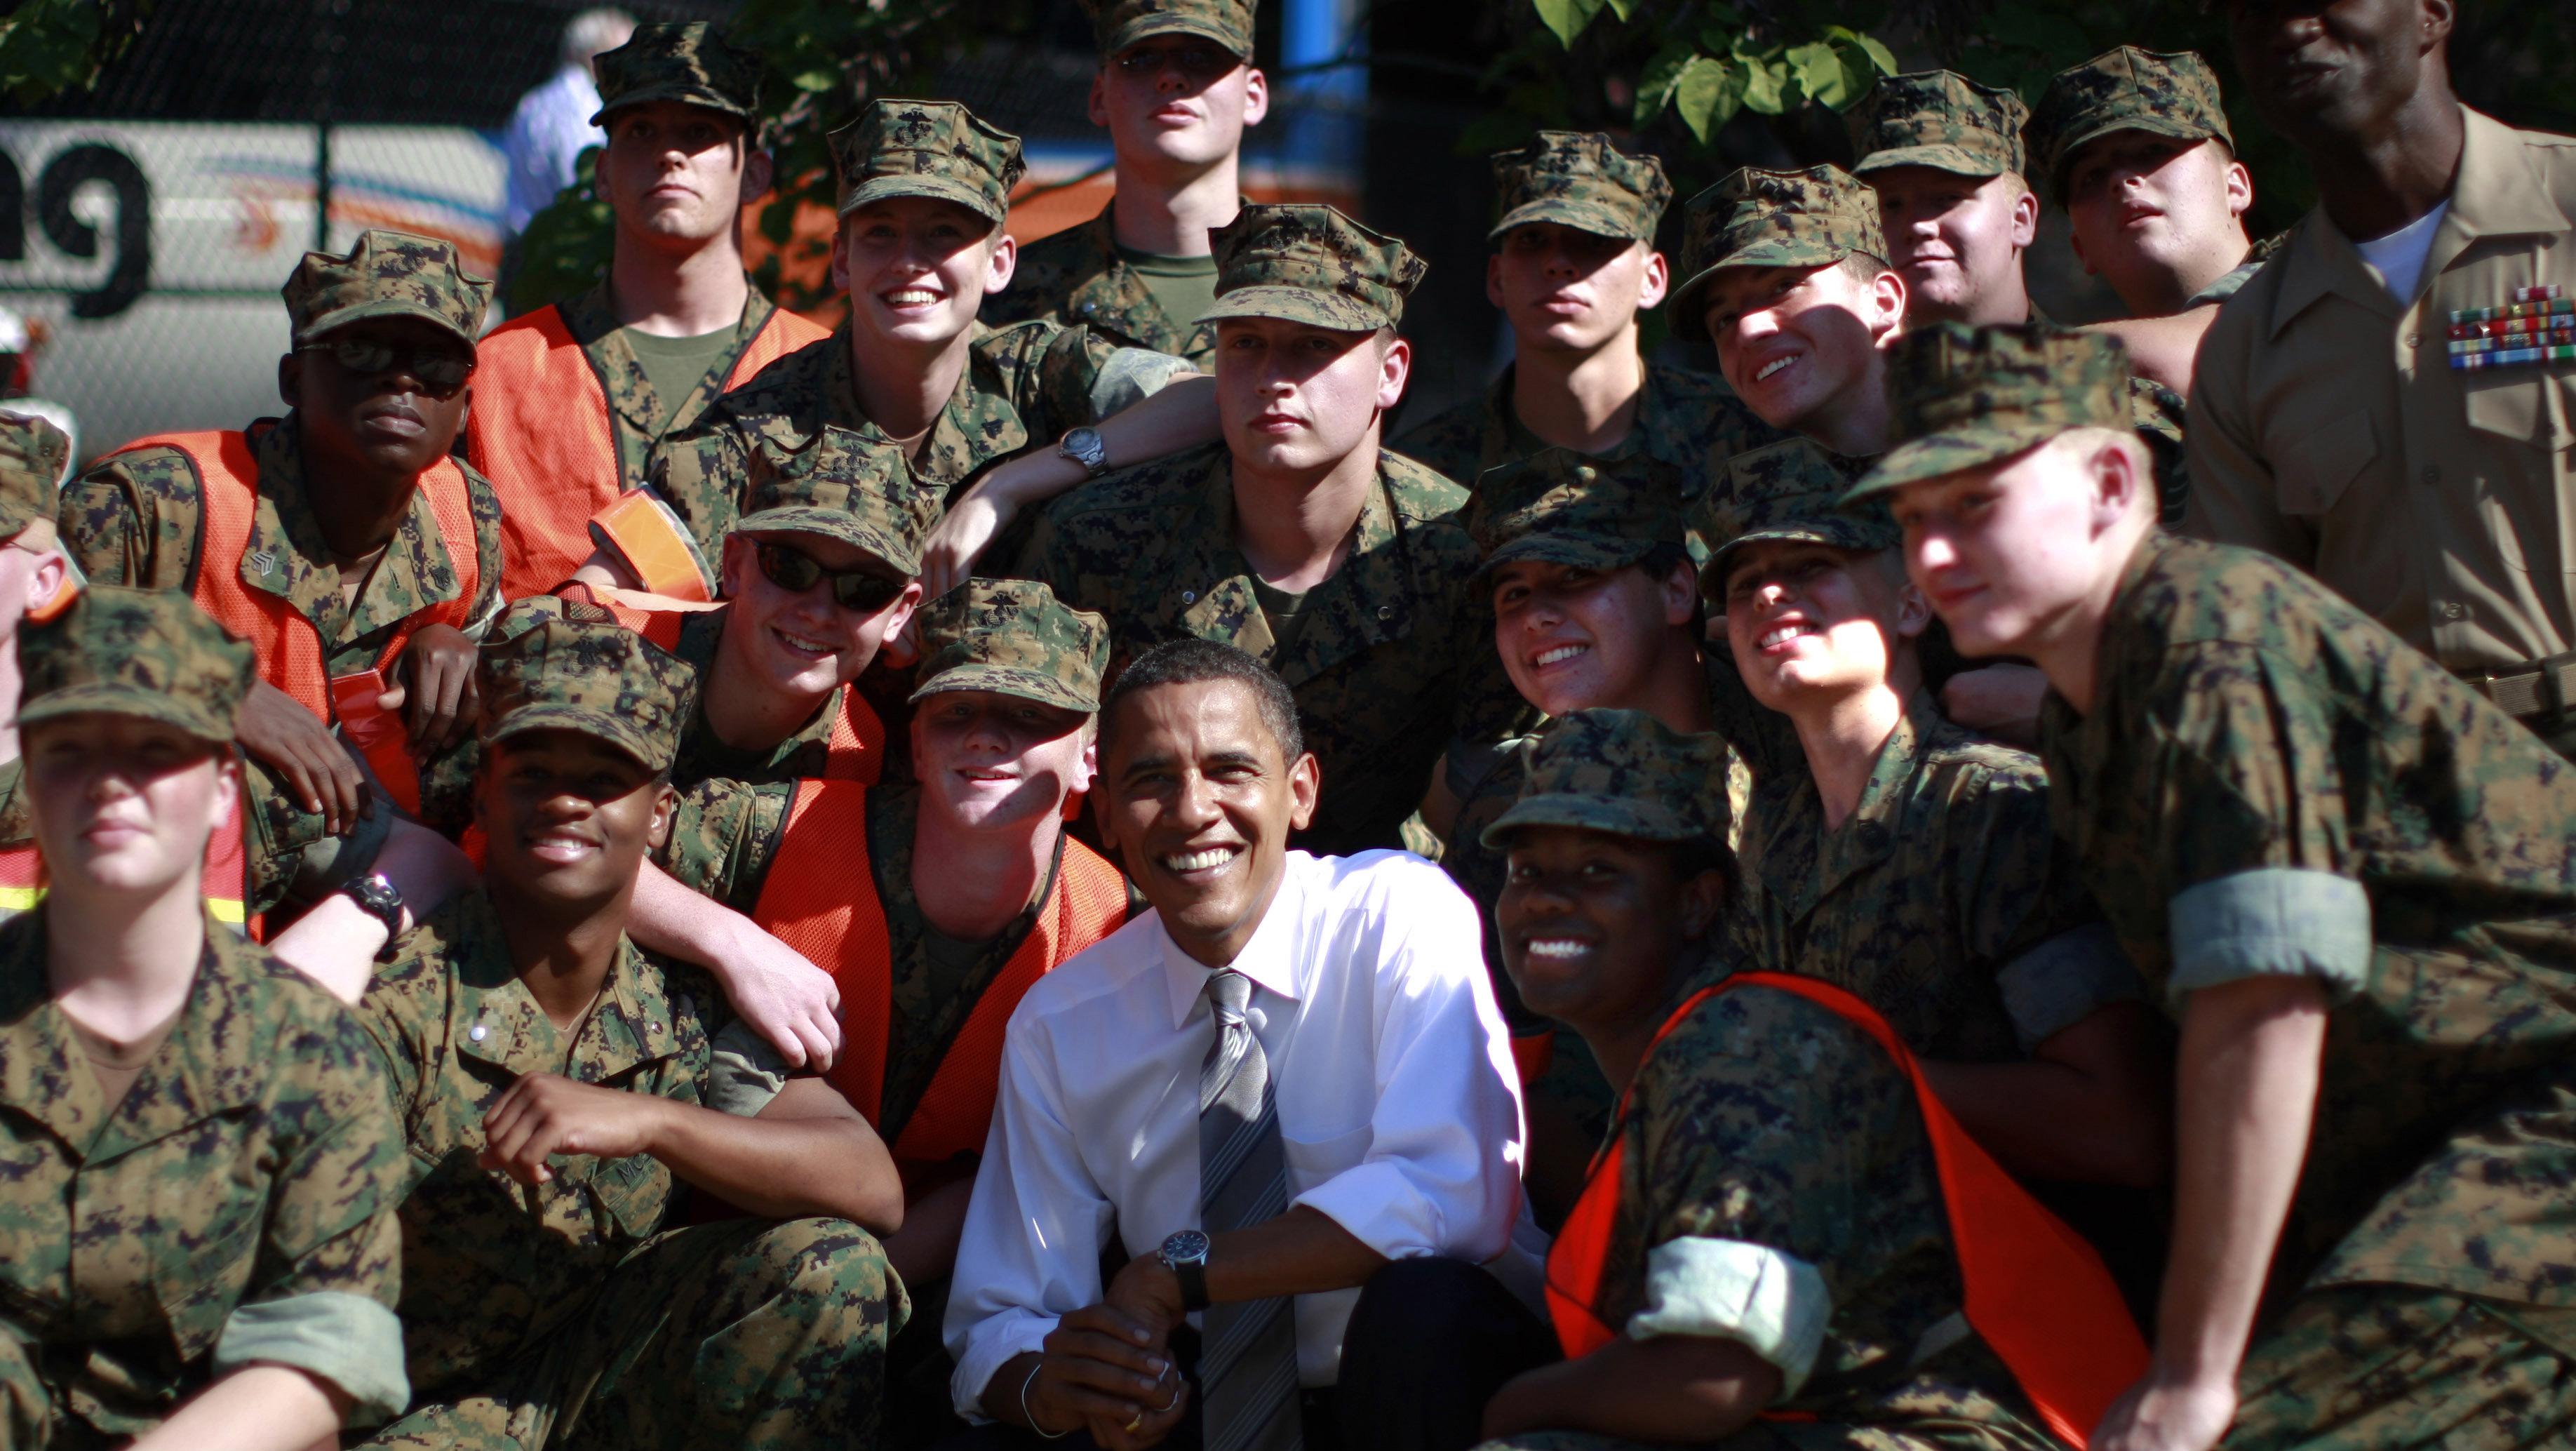 U.S. Democratic presidential nominee Senator Barack Obama (D-IL) poses with U.S. Marine Junior ROTC following a campaign rally in Asheville, North Carolina, October 5, 2008.